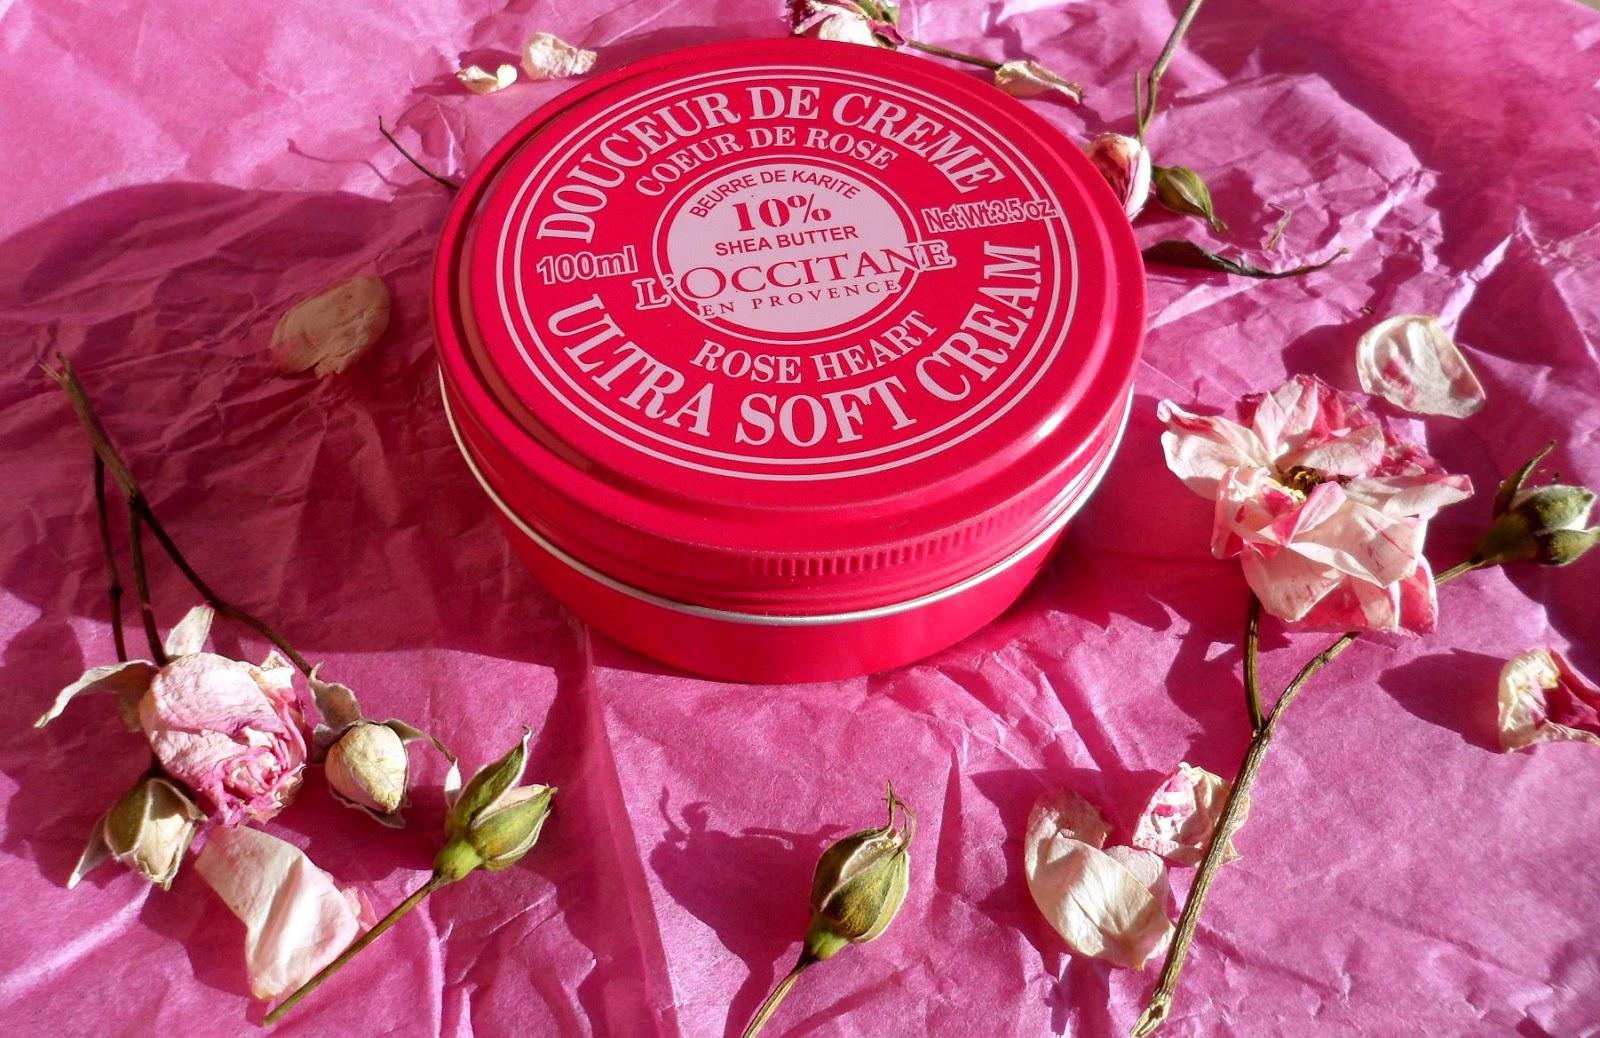 Occitane ultra soft cream rose heart review локситан